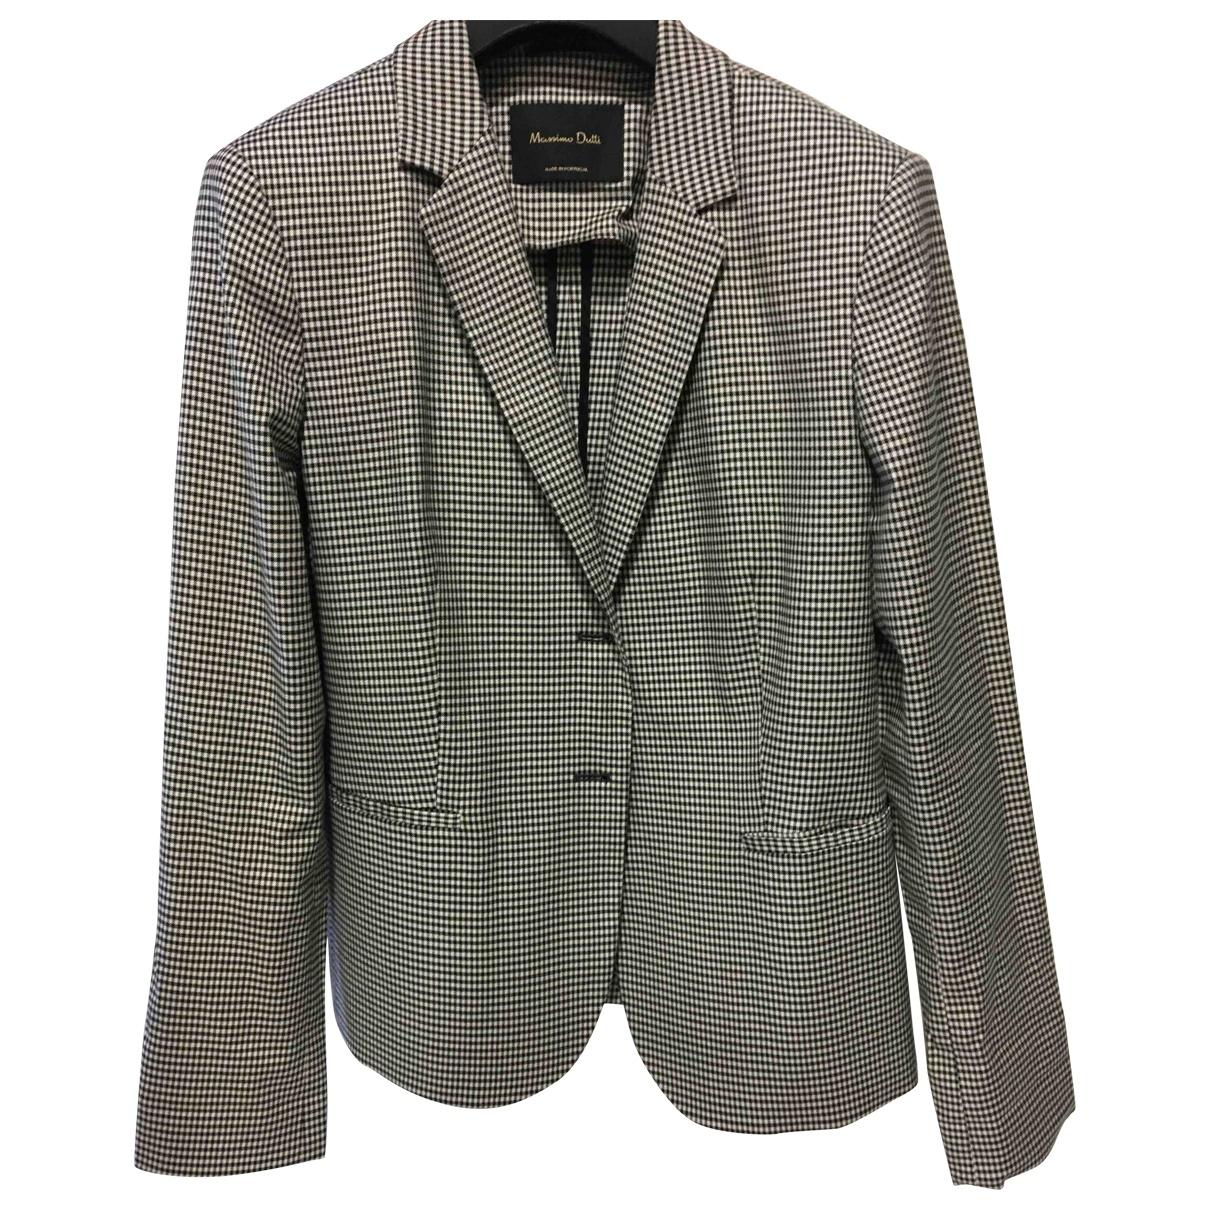 Massimo Dutti \N Jacke in  Schwarz Polyester